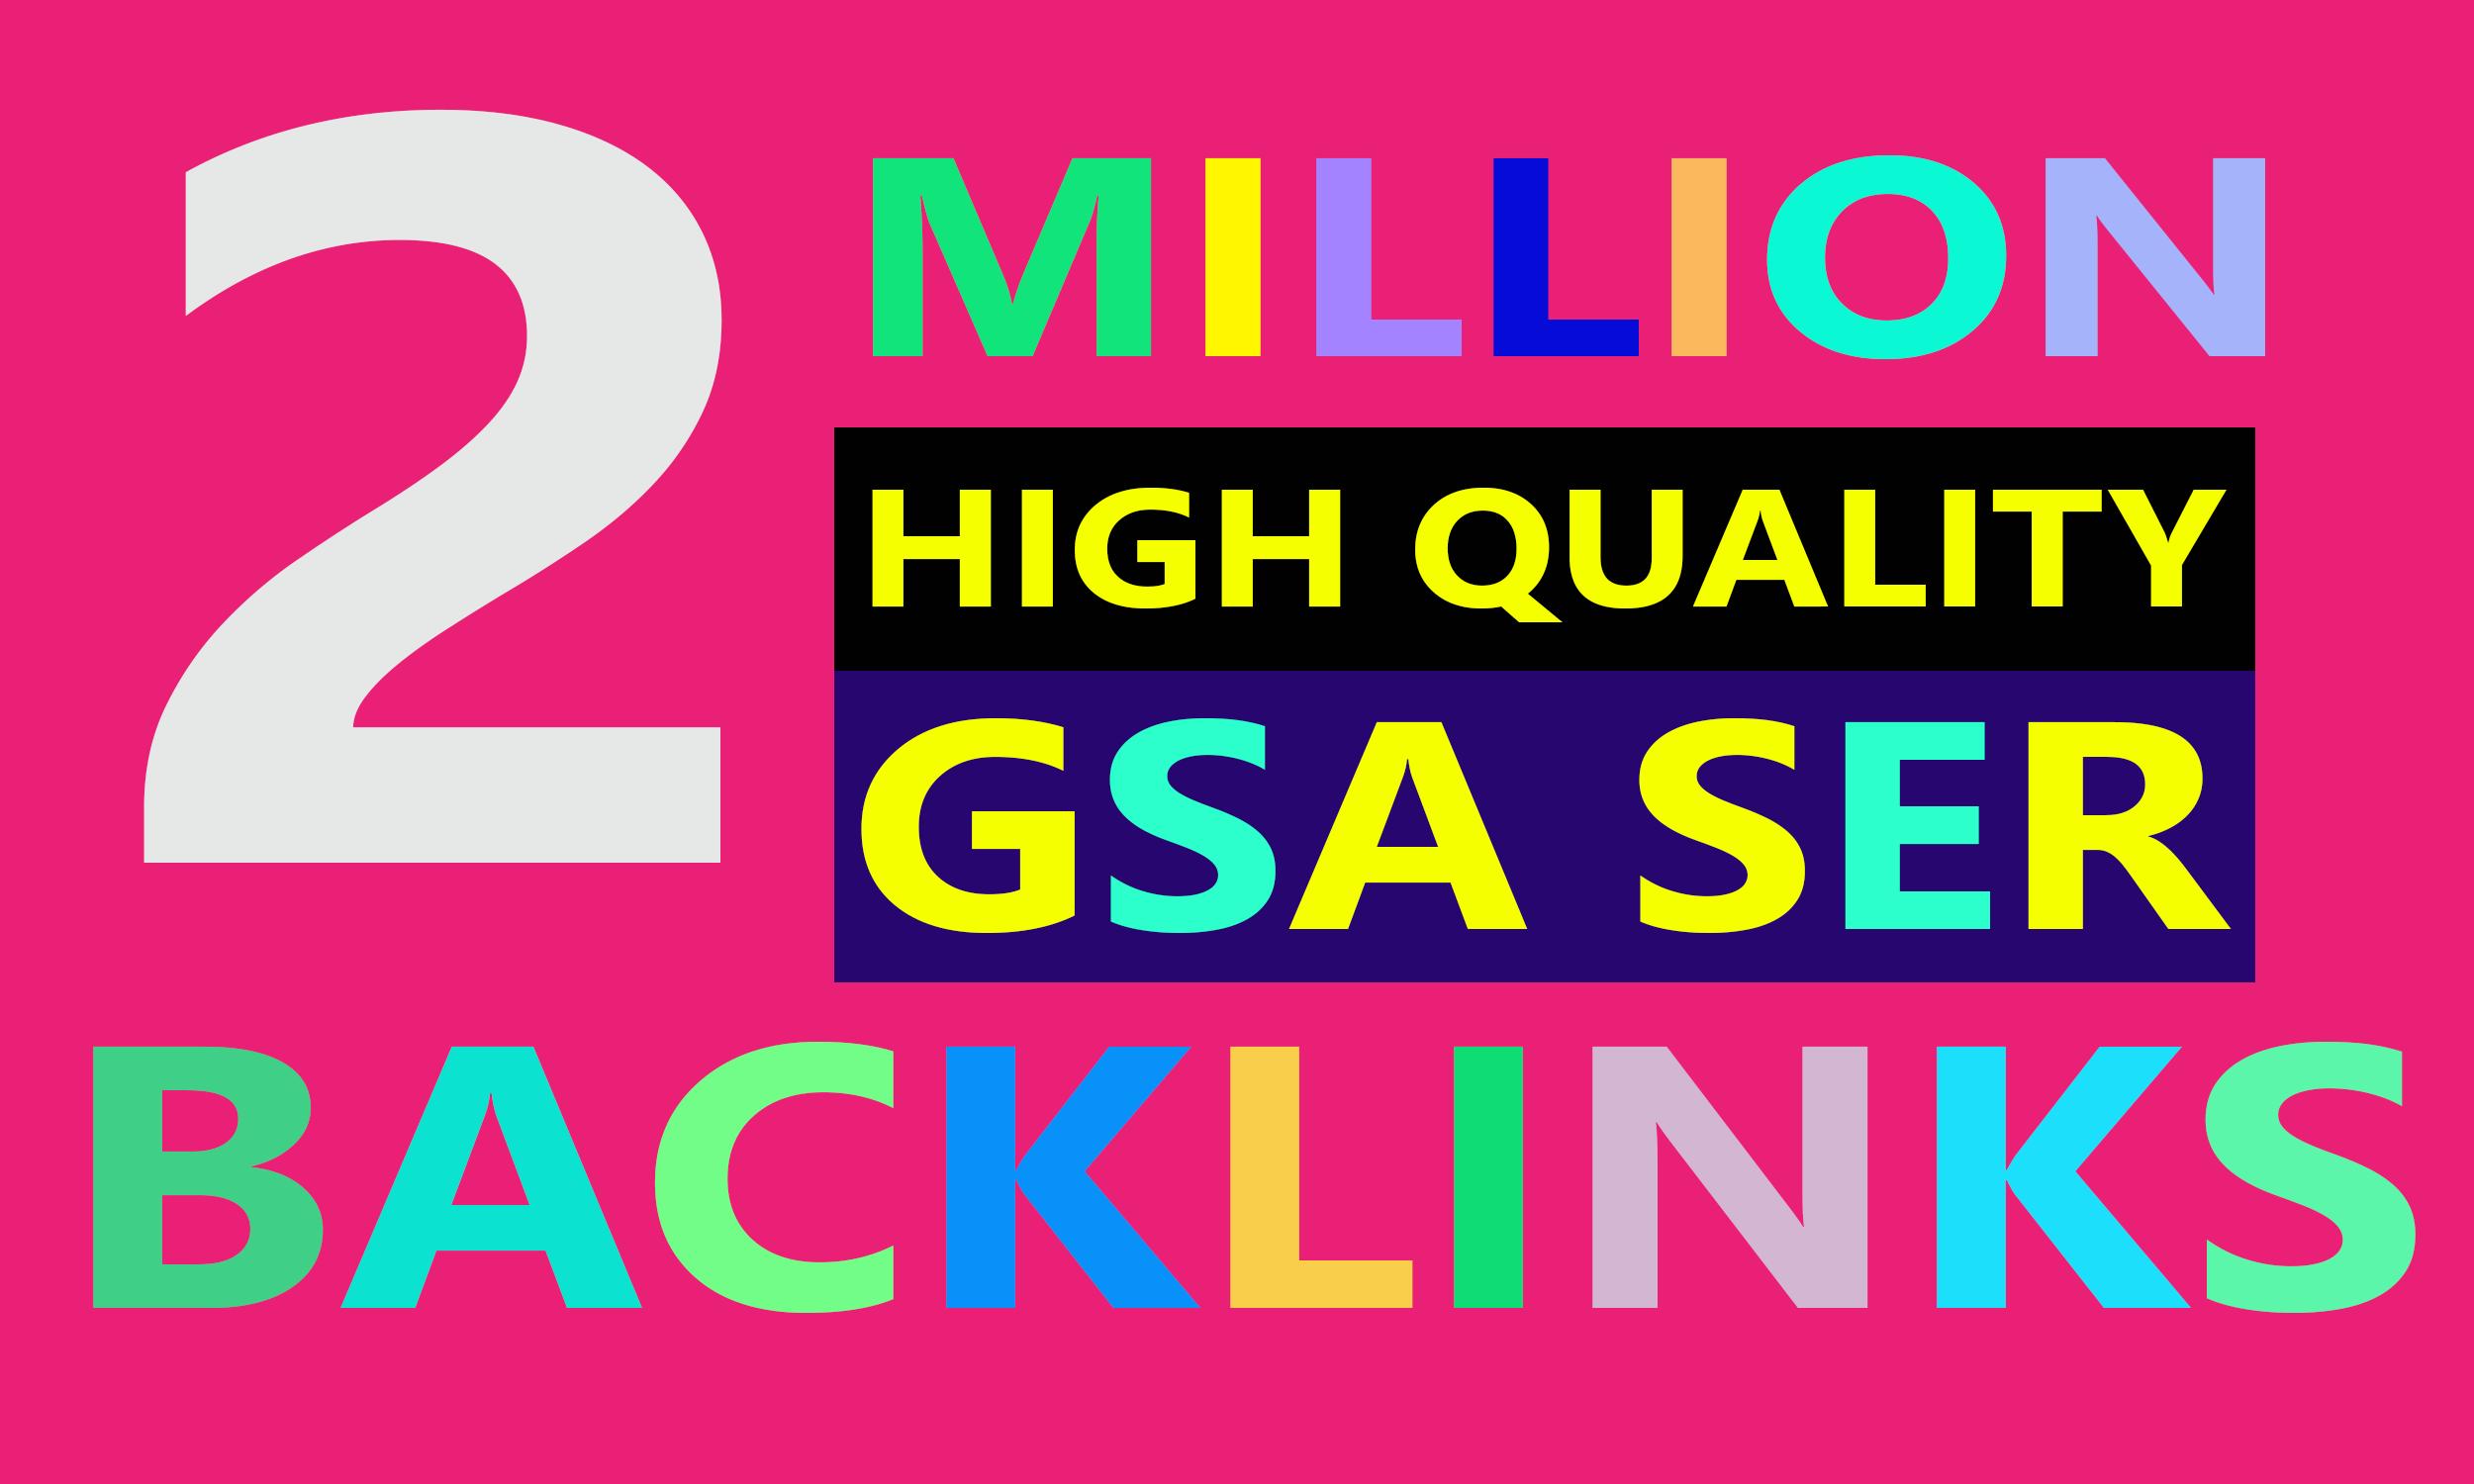 2 Million High Quality GSA SER Backlinks and Rank your website